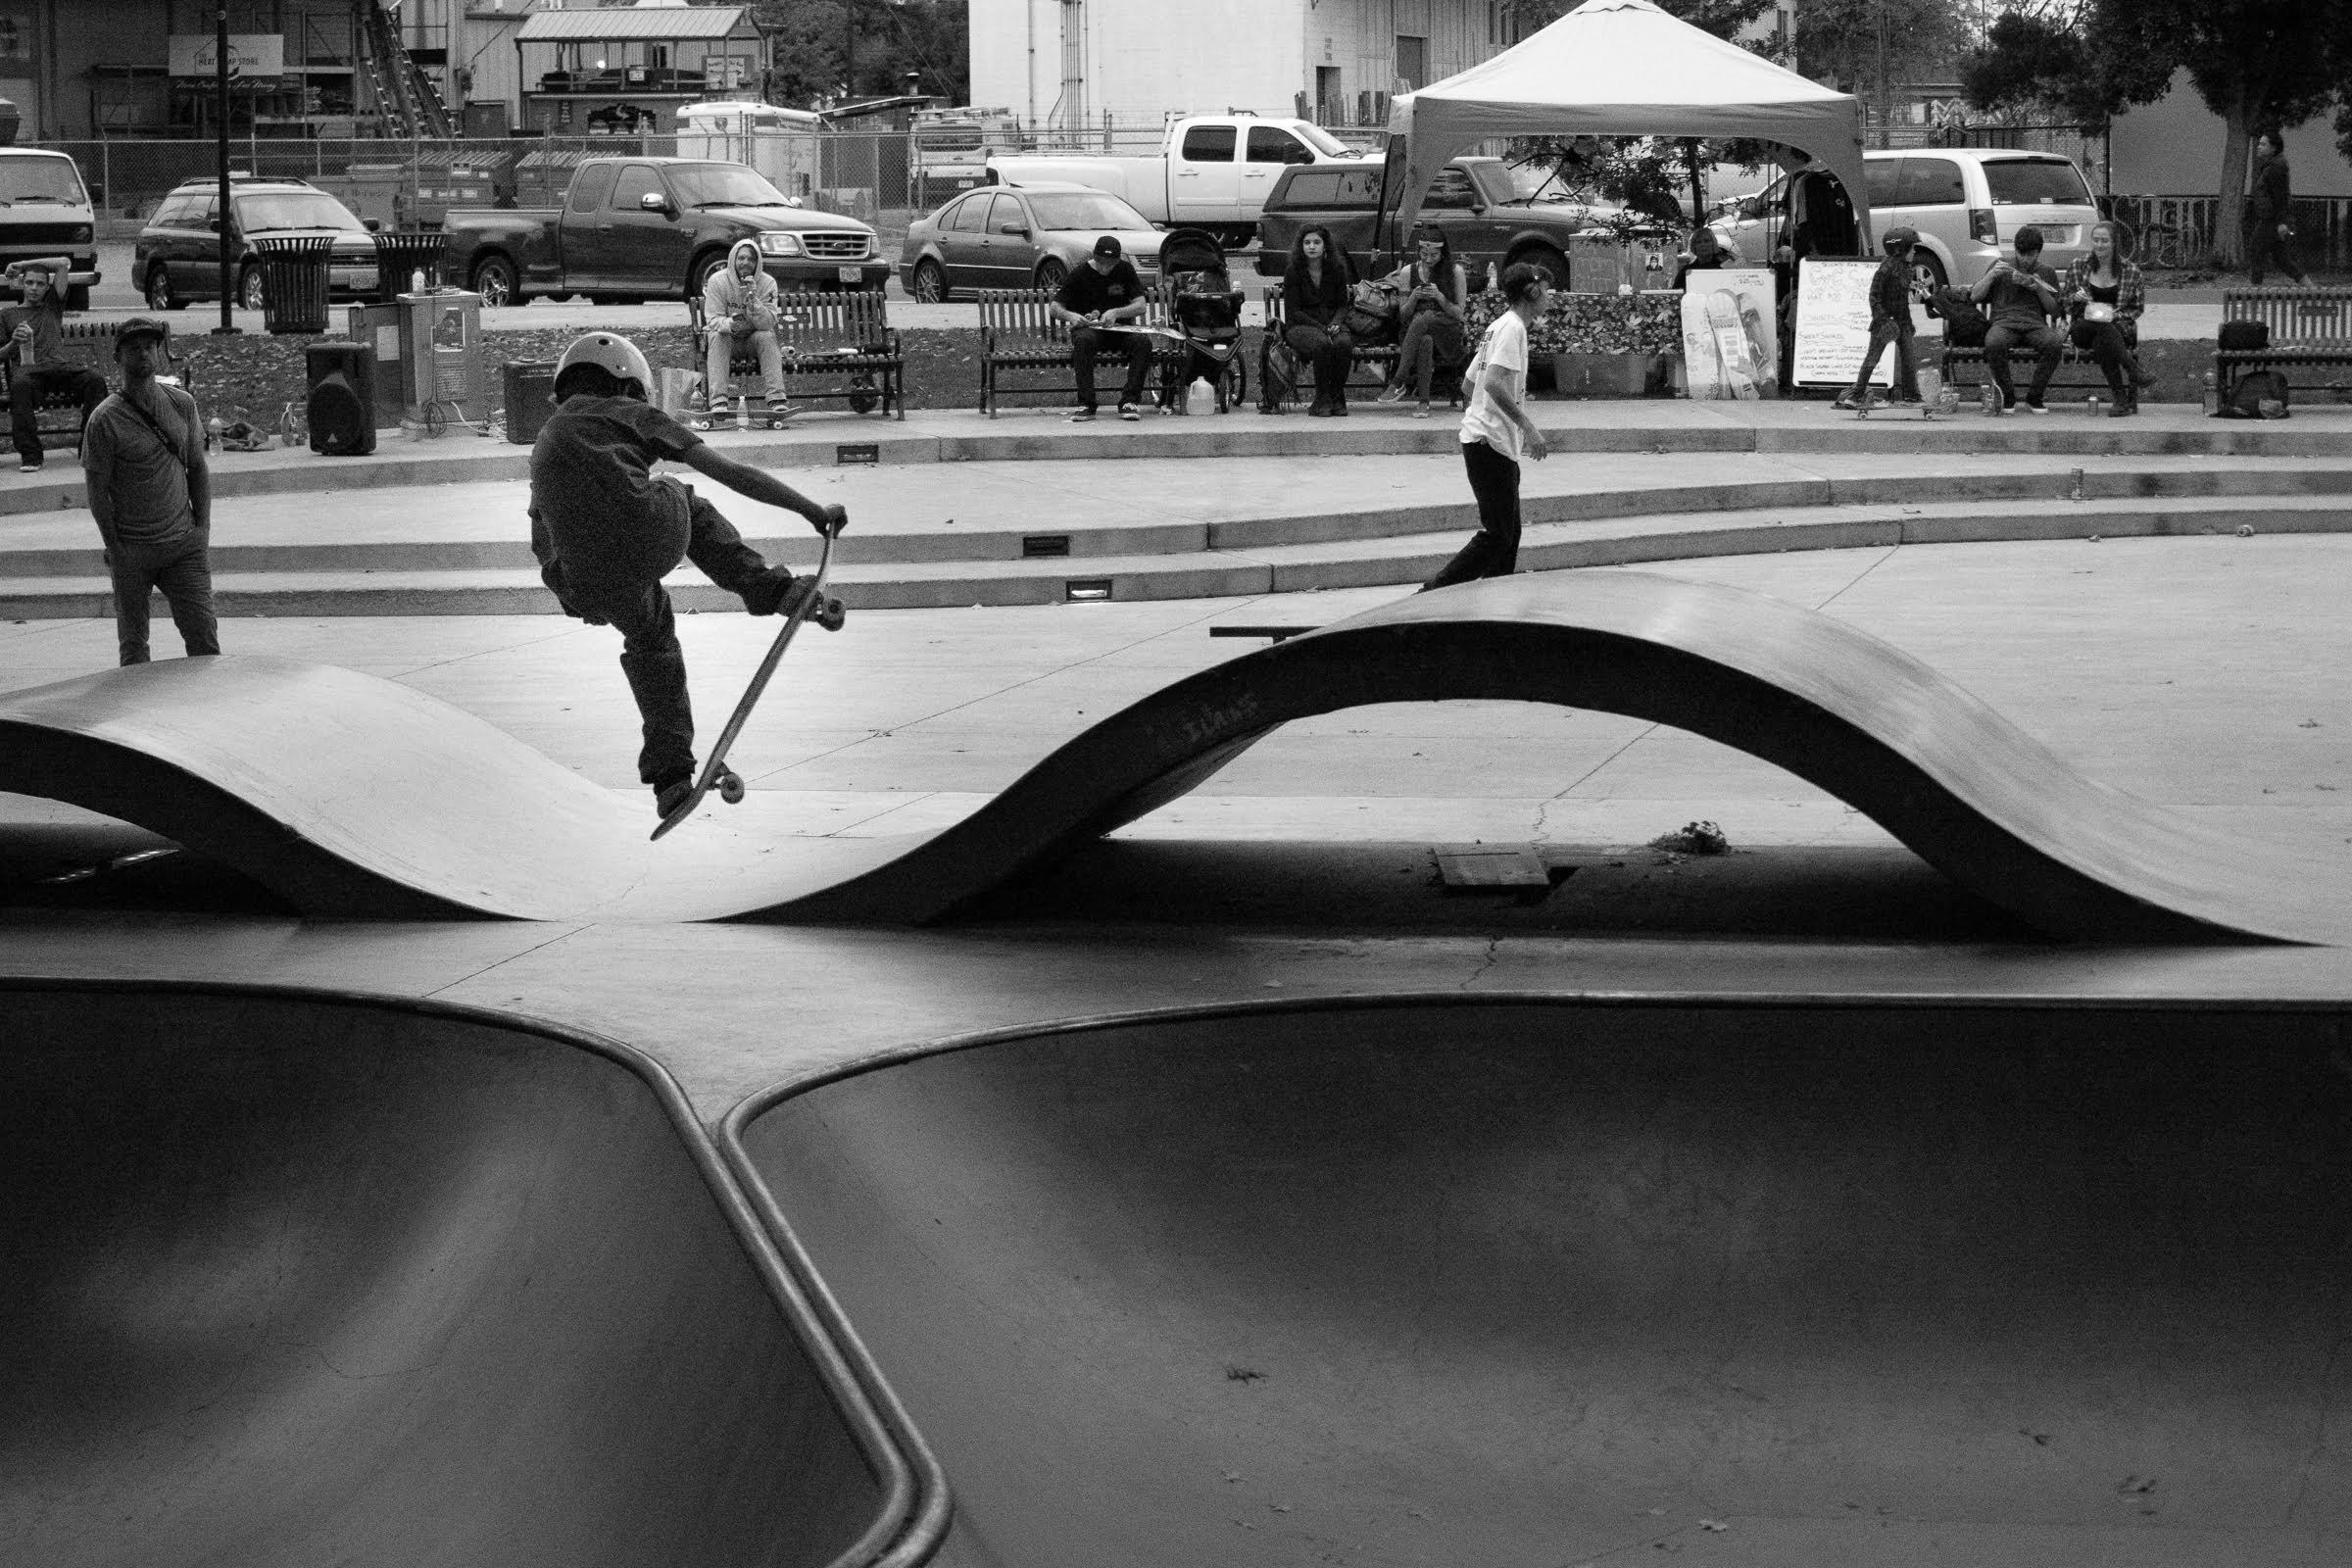 Mason Bucknell - Nosegrab Transfer - Photo. Zina Kraskoff